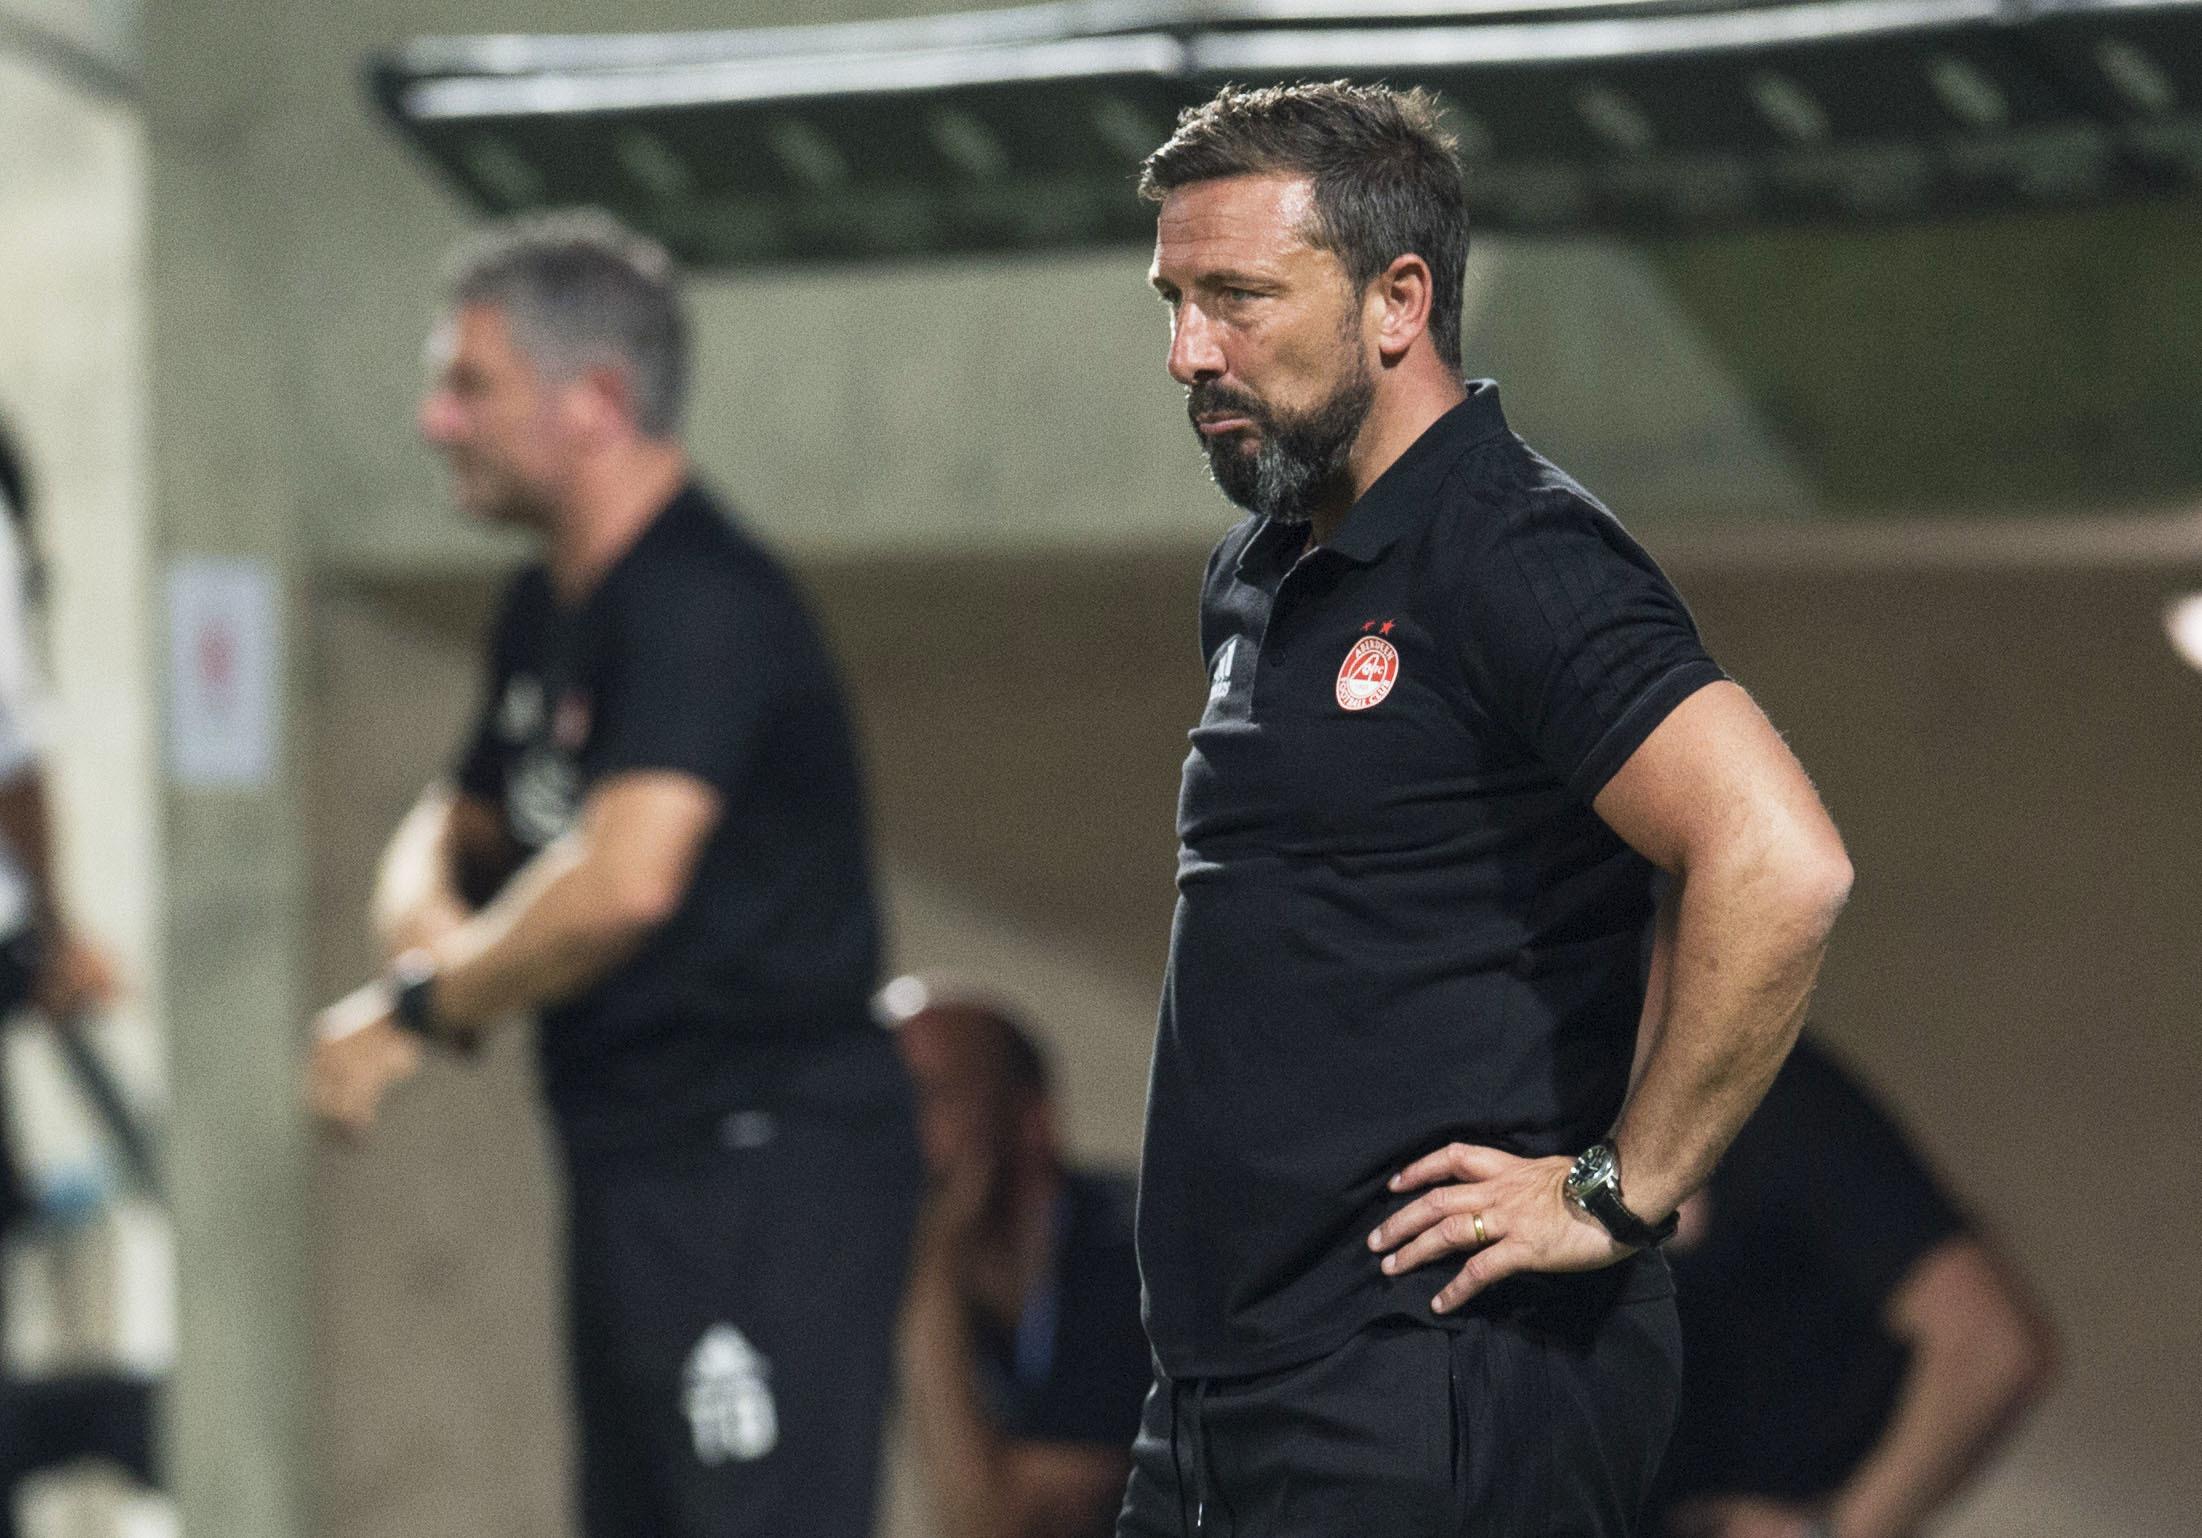 Aberdeen manager Derek McInnes at full-time in Cyprus.